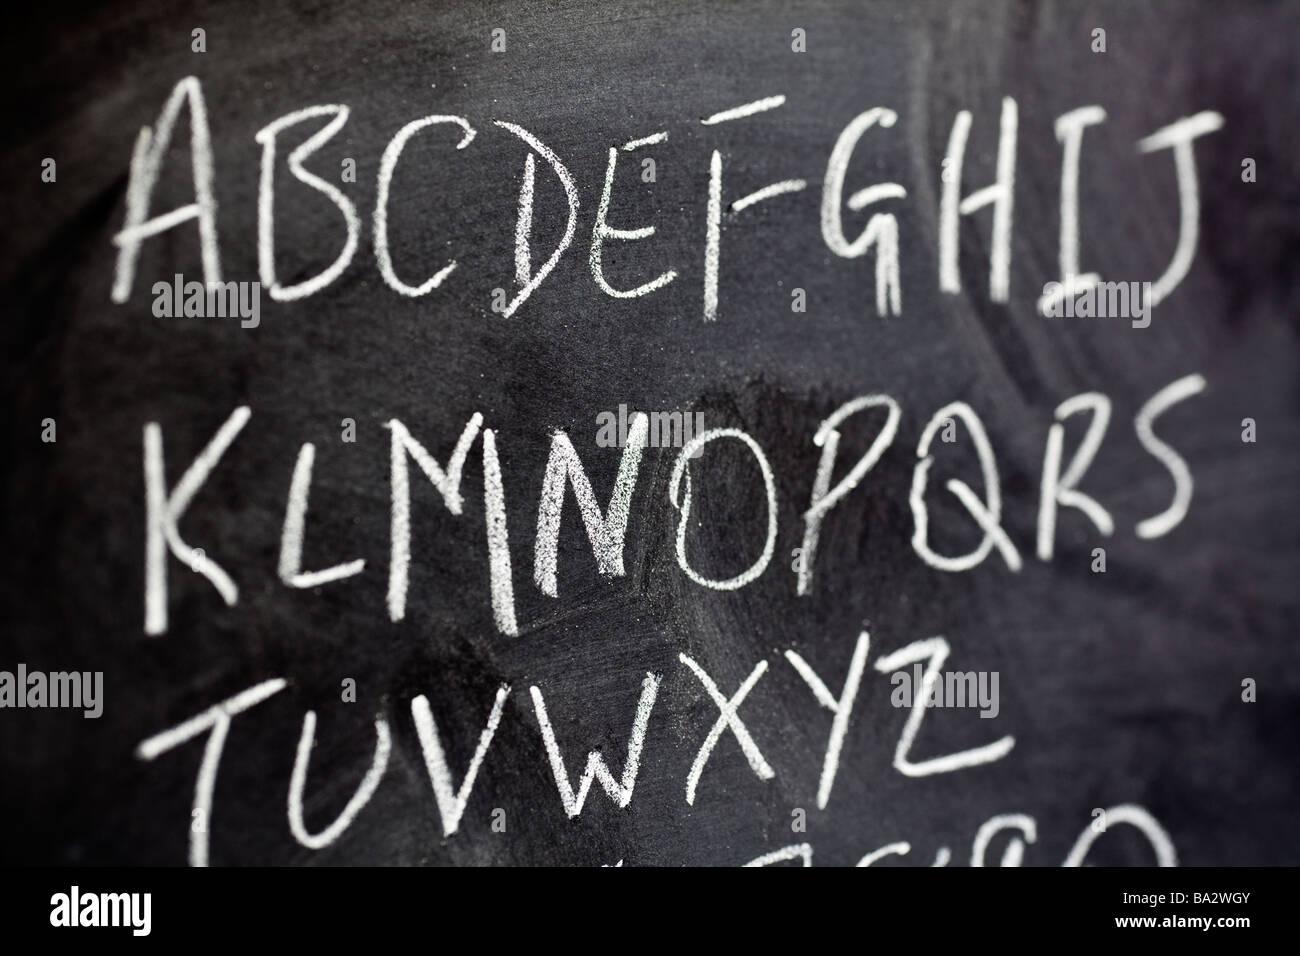 Alphabet written on blackboard close up selective focus - Stock Image